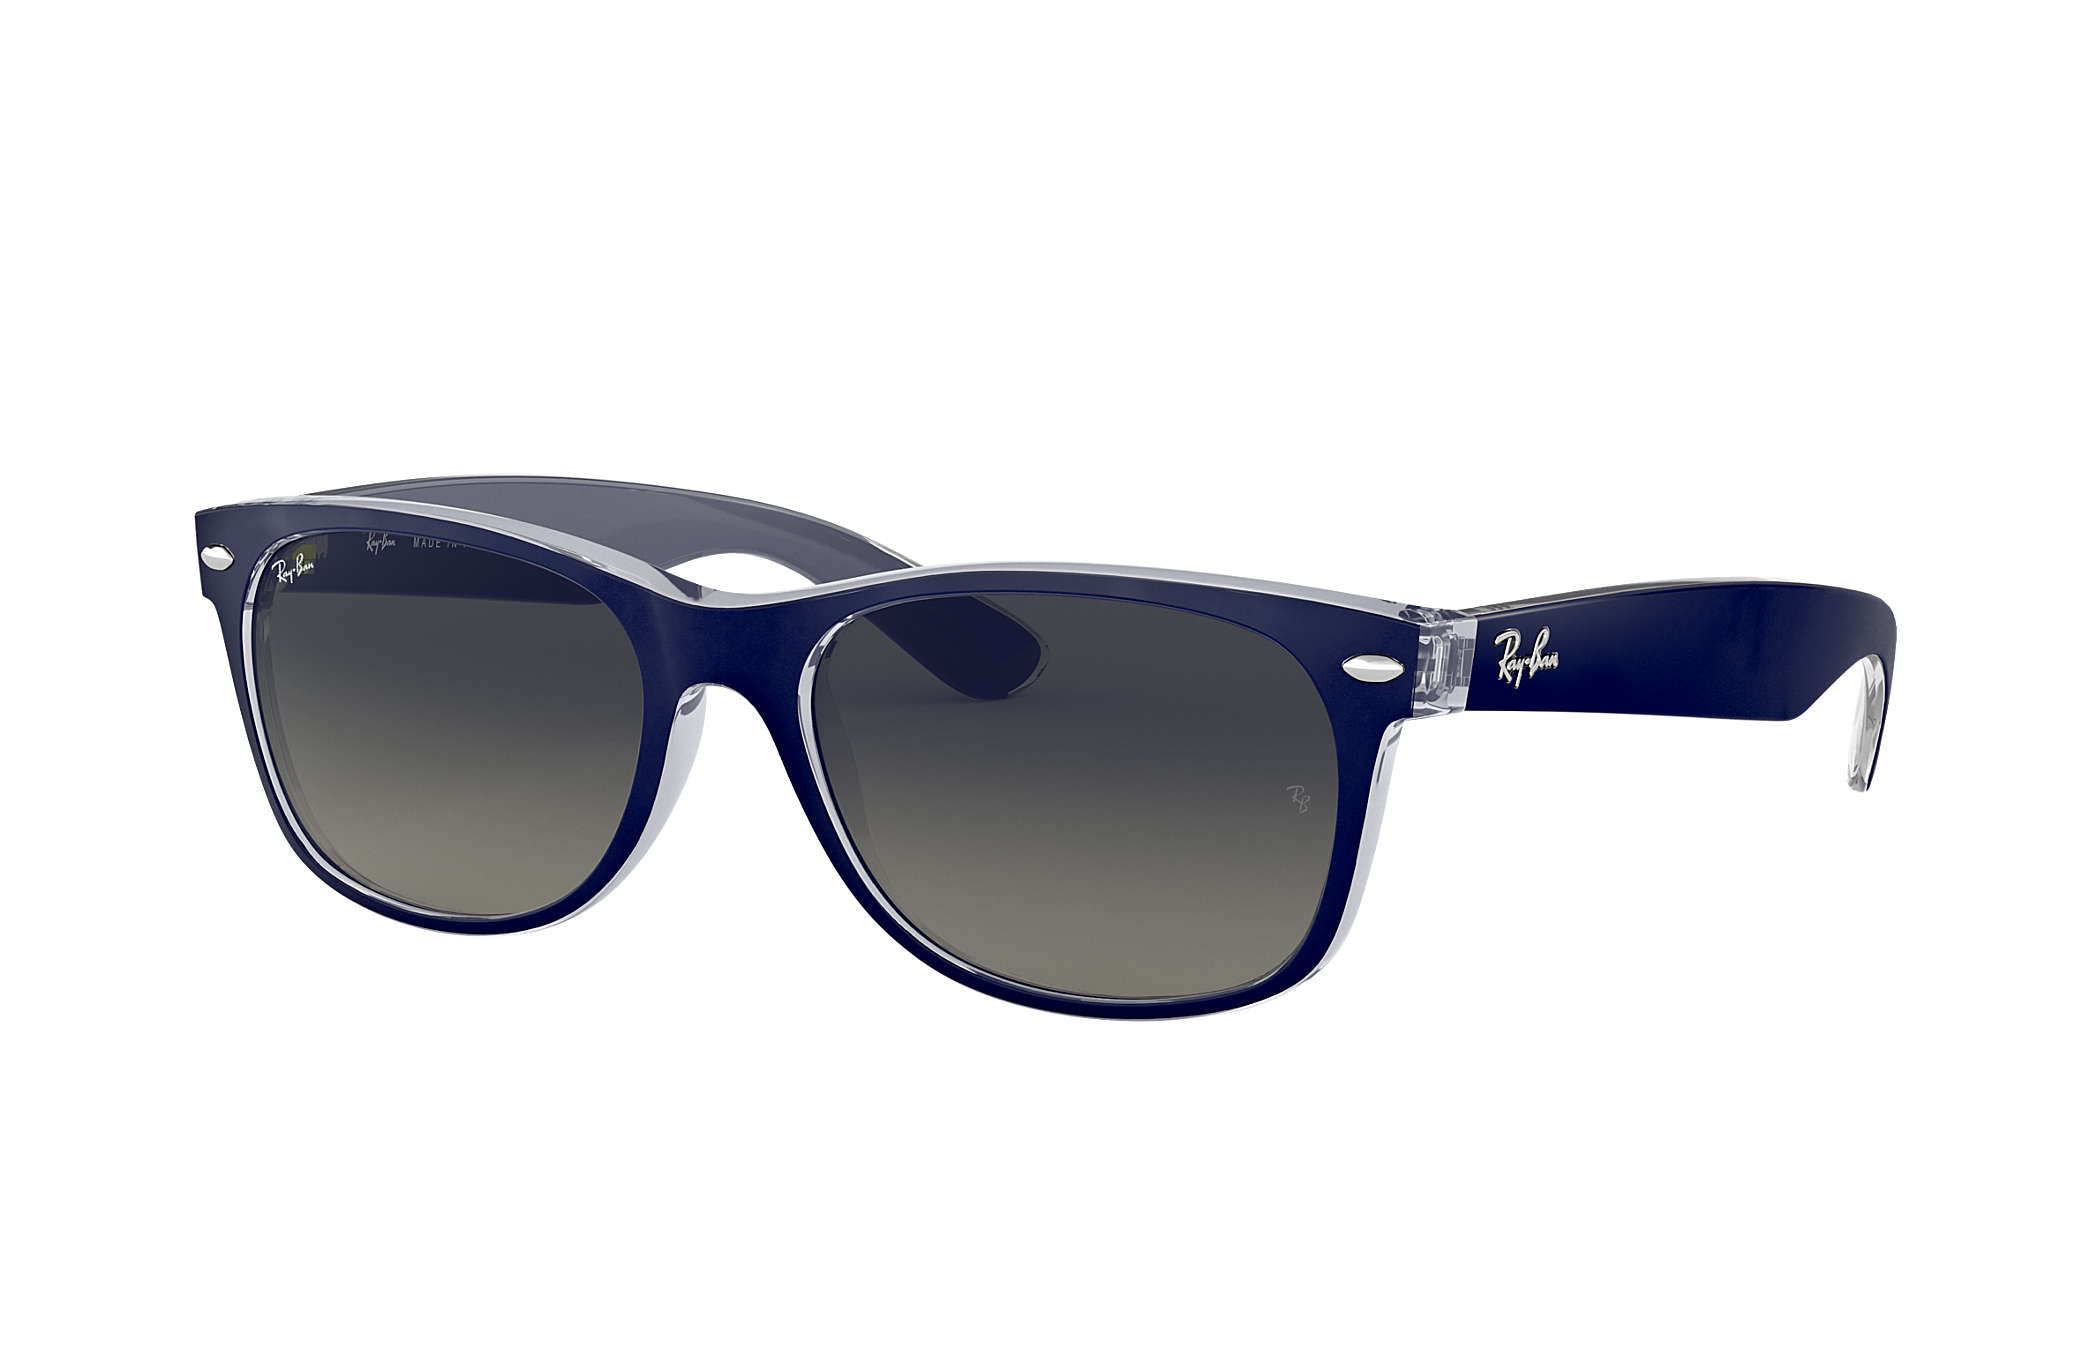 Ray-Ban New Wayfarer Color Mix RB2132 Azul - Nylon - Lentes Cinzento ... c55738ee48